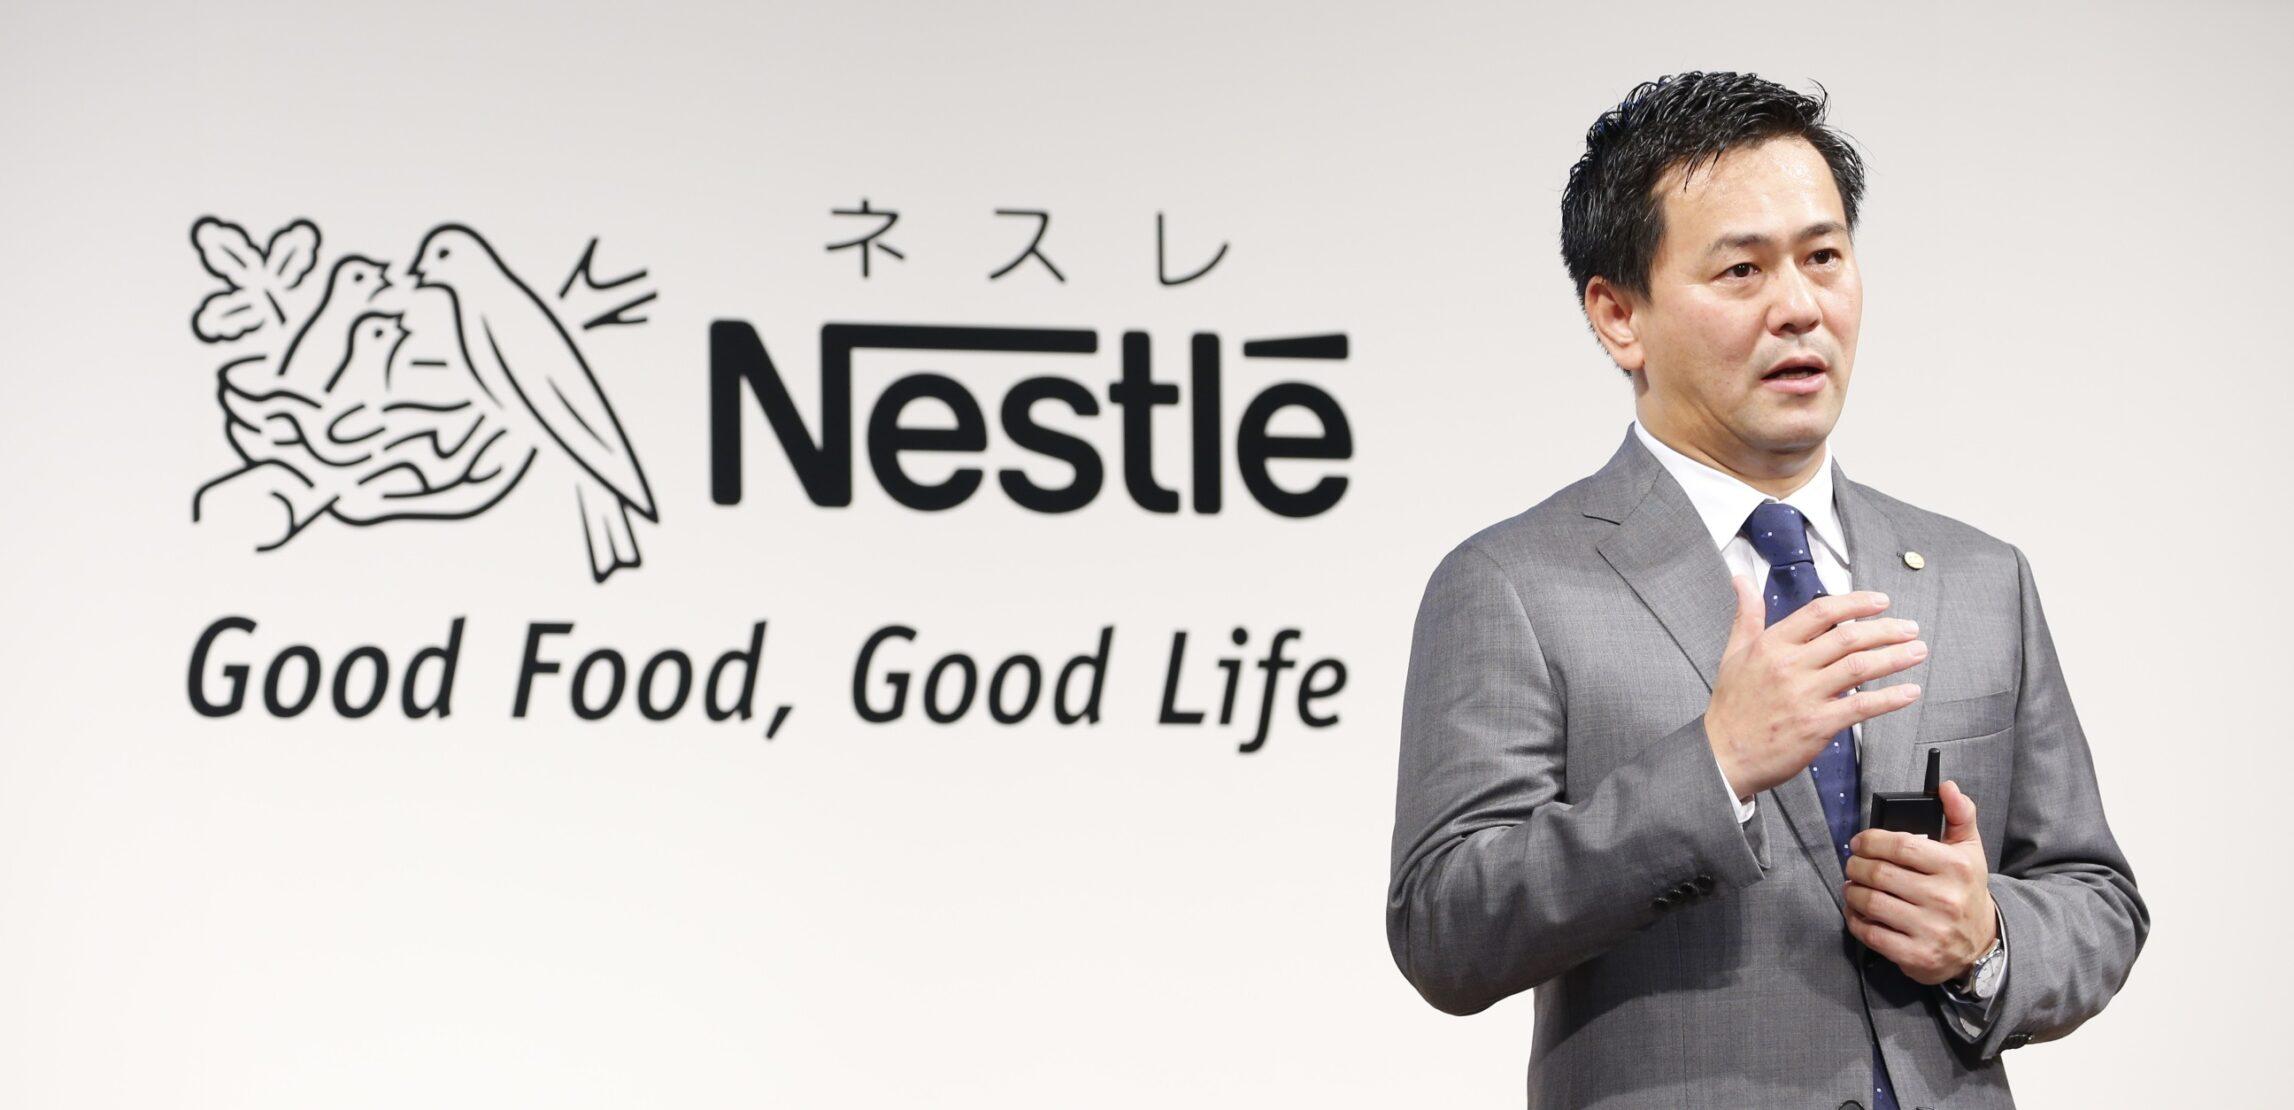 Meet the SCCIJ Members #5 – Tatsuhiko Fukatani, CEO, President and Representative Director, Nestlé Japan Ltd.